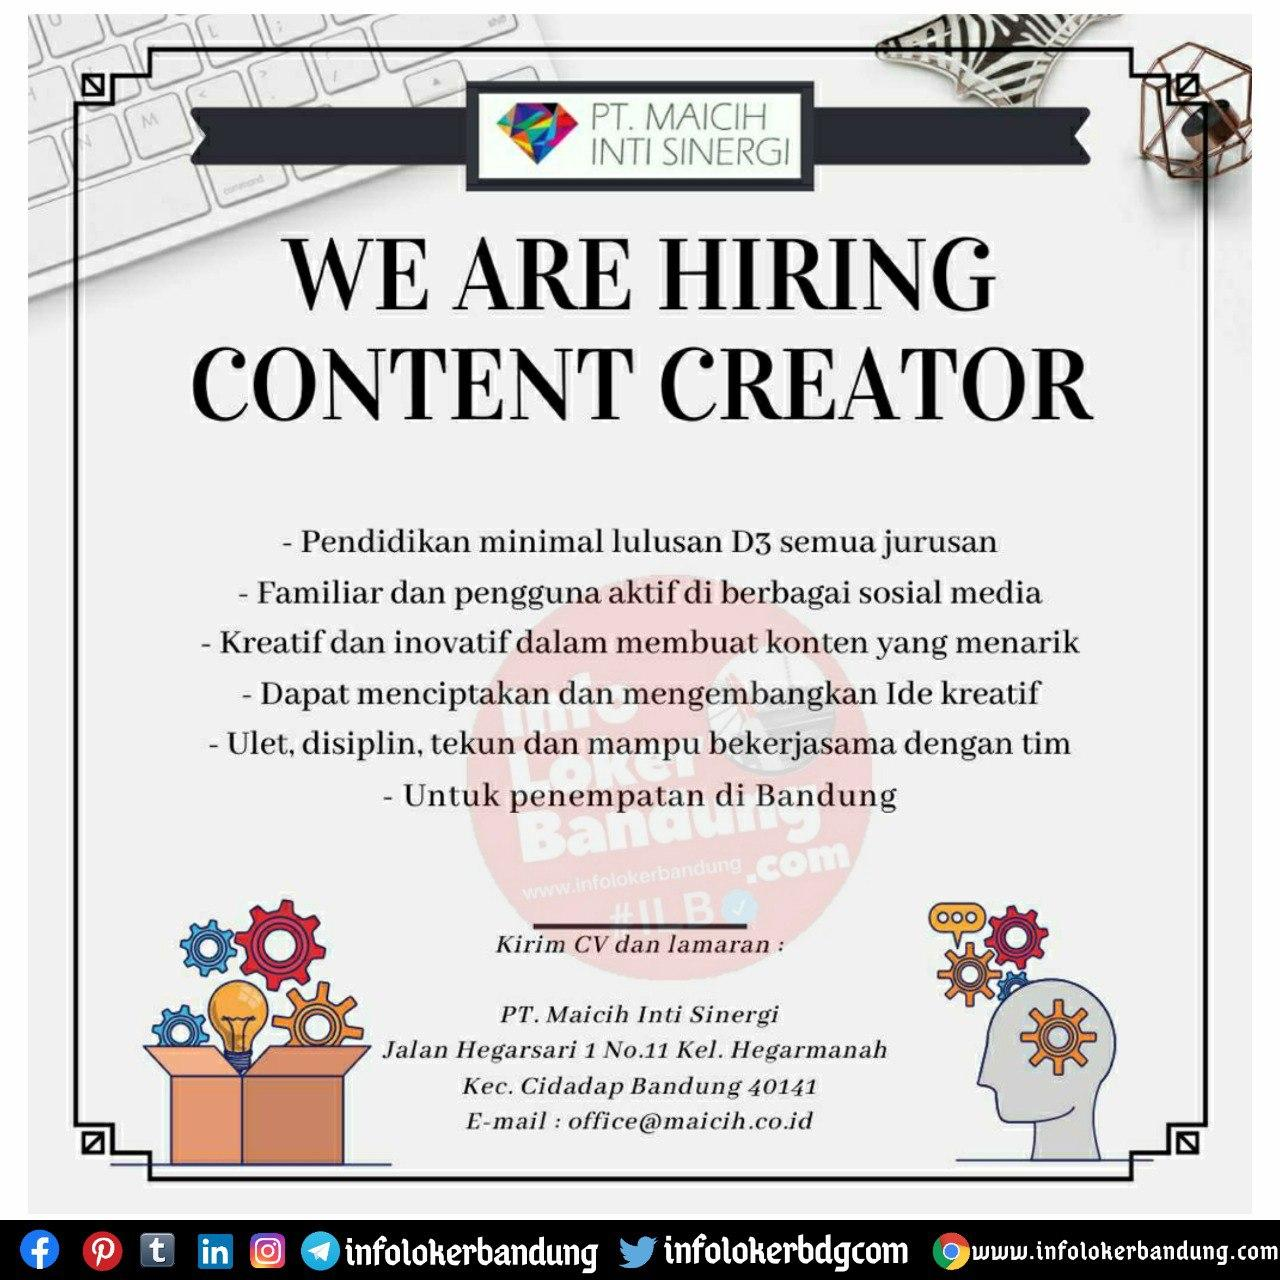 Lowongan Kerja Content Creator PT. Maicih Inti Sinergi ( Kripik Maicih ) Bandung Oktober 2020